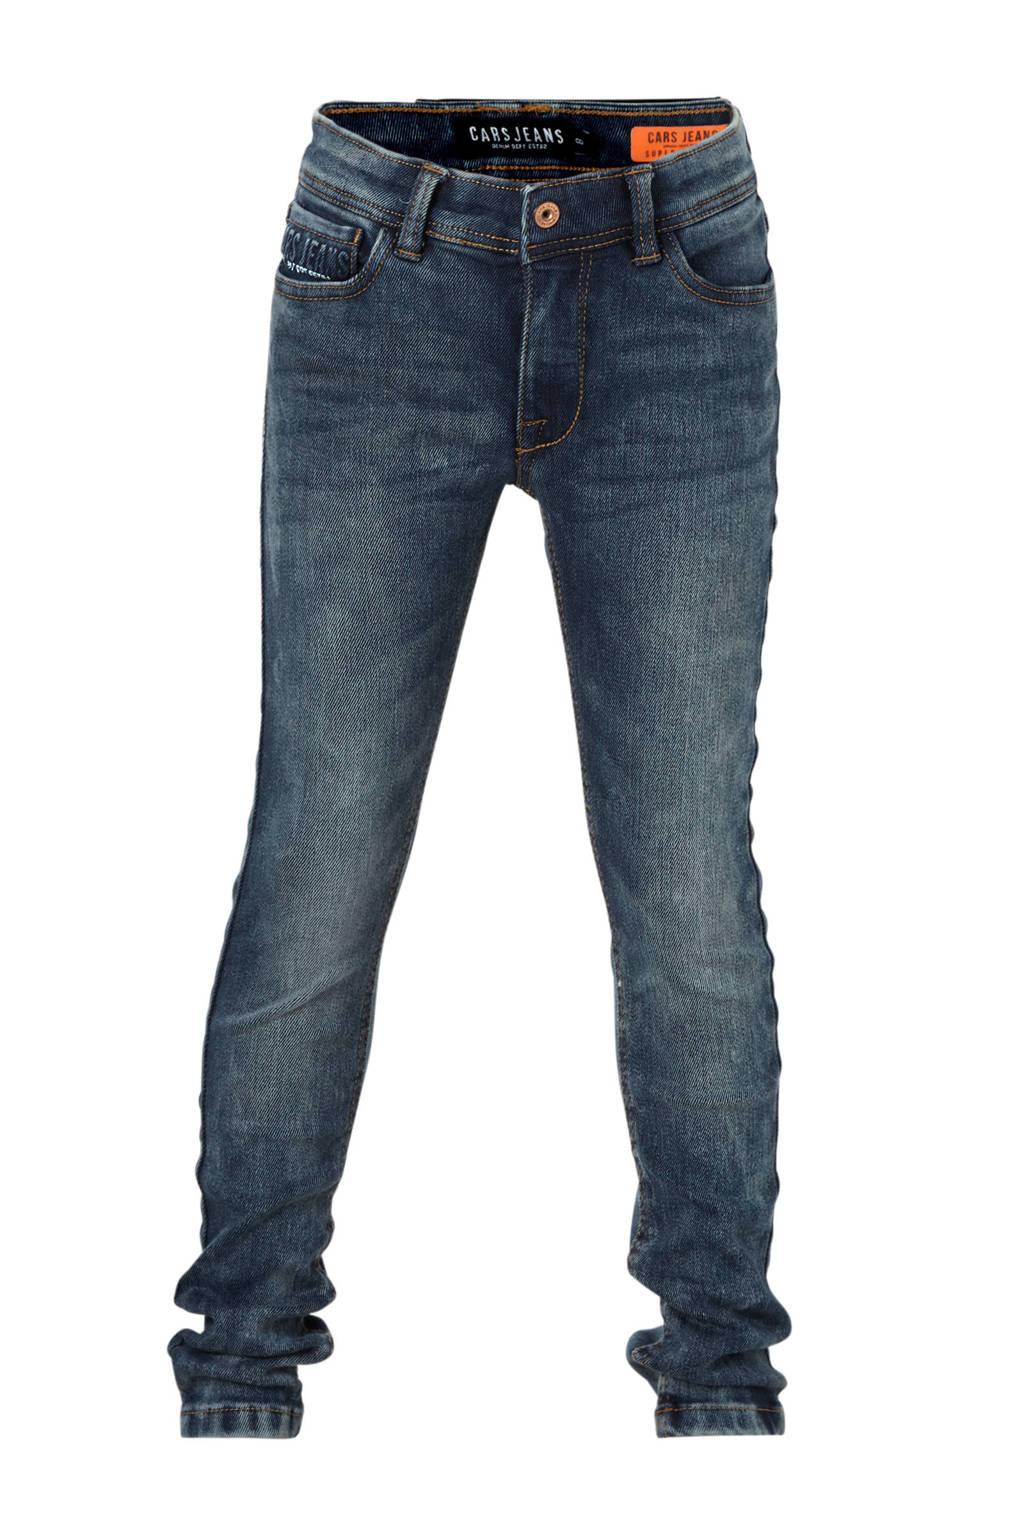 Cars super skinny jeans Iron donkerblauw, Donkerblauw